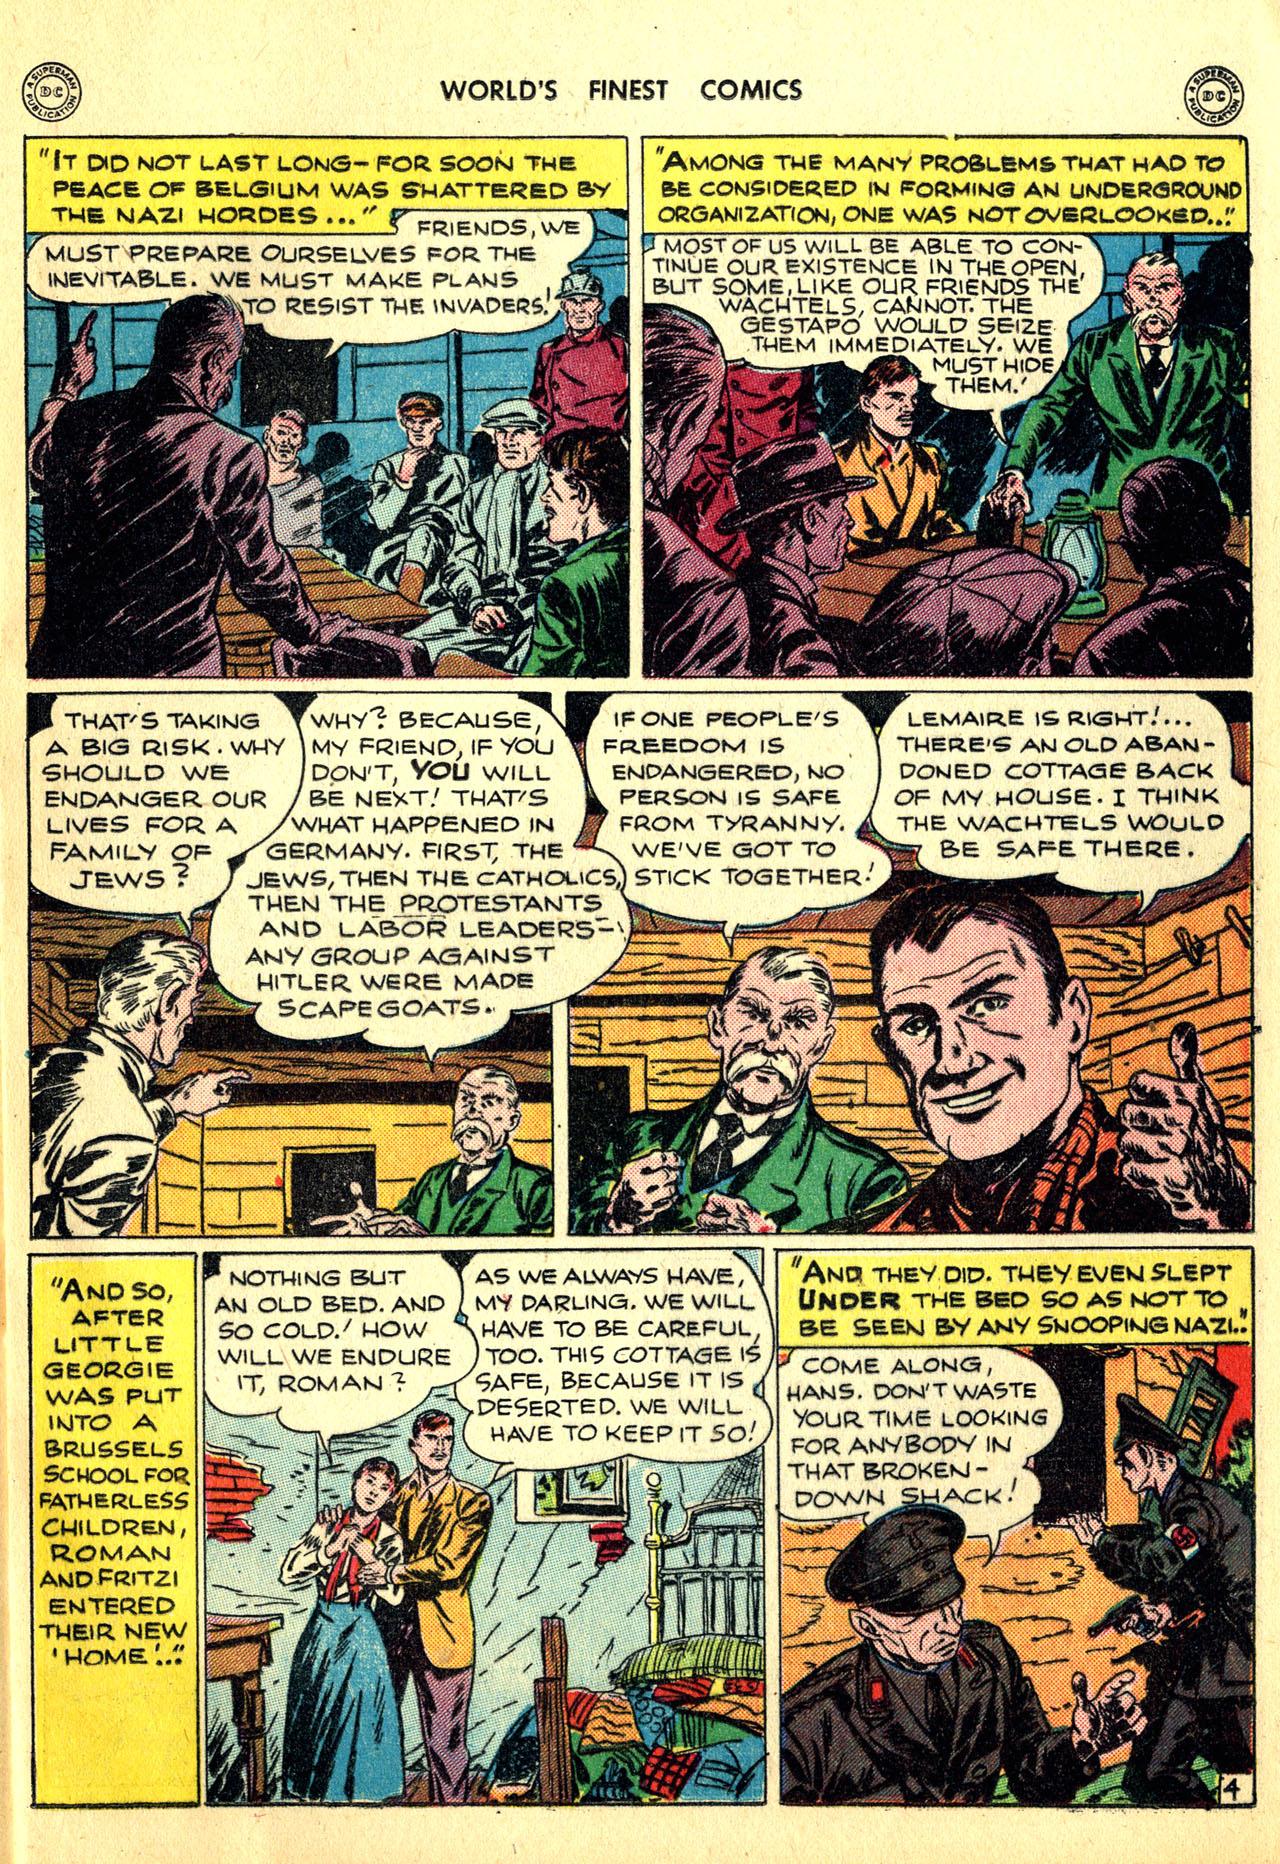 Read online World's Finest Comics comic -  Issue #18 - 63